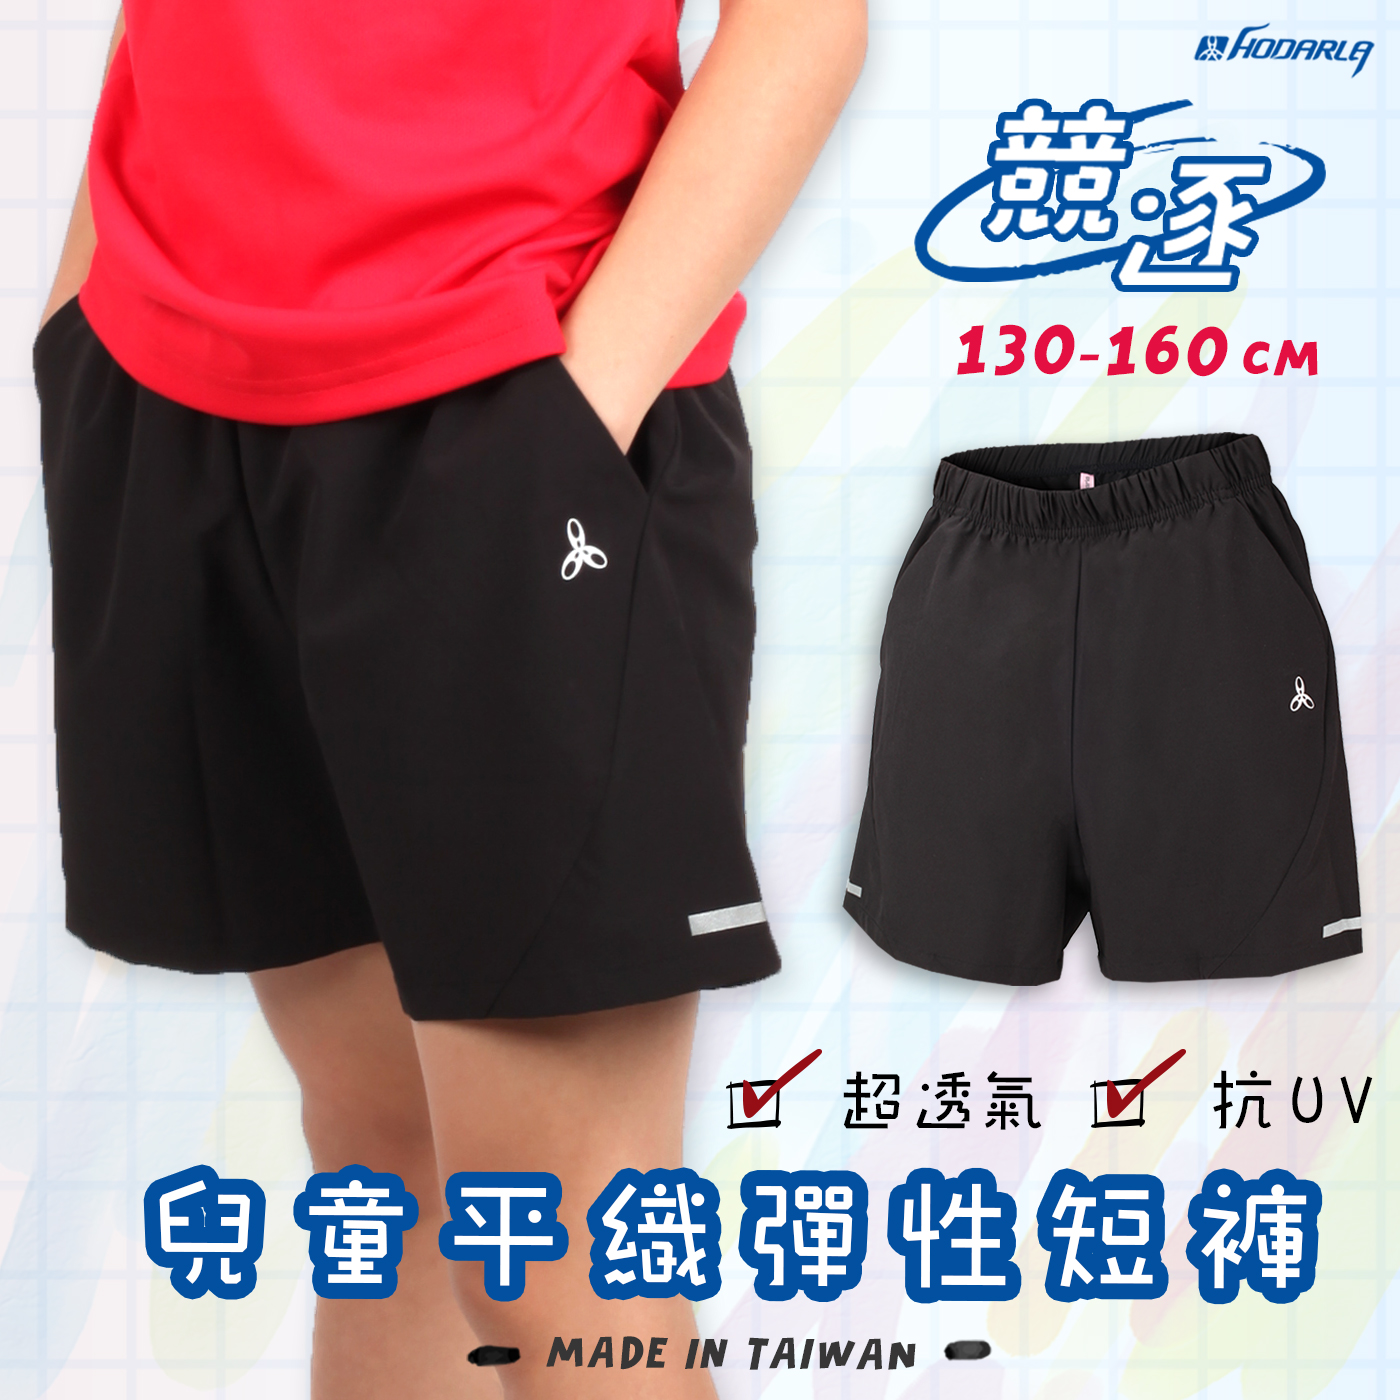 HODARLA 童-競逐平織彈性短褲 3144101